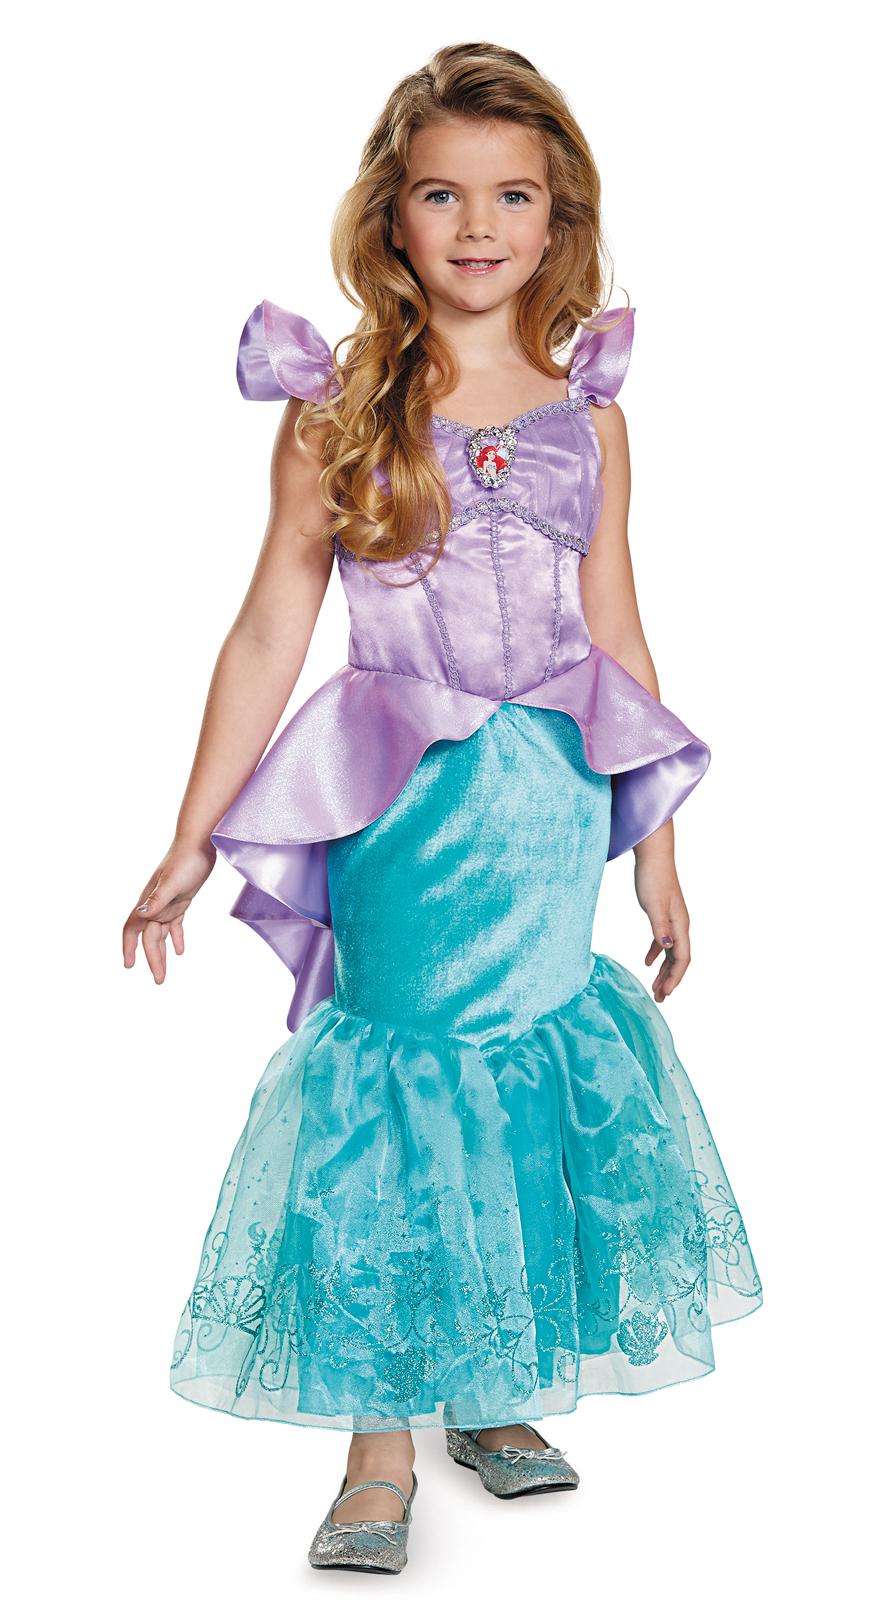 The Little Mermaid Storybook Ariel Prestige Toddler / Child ...